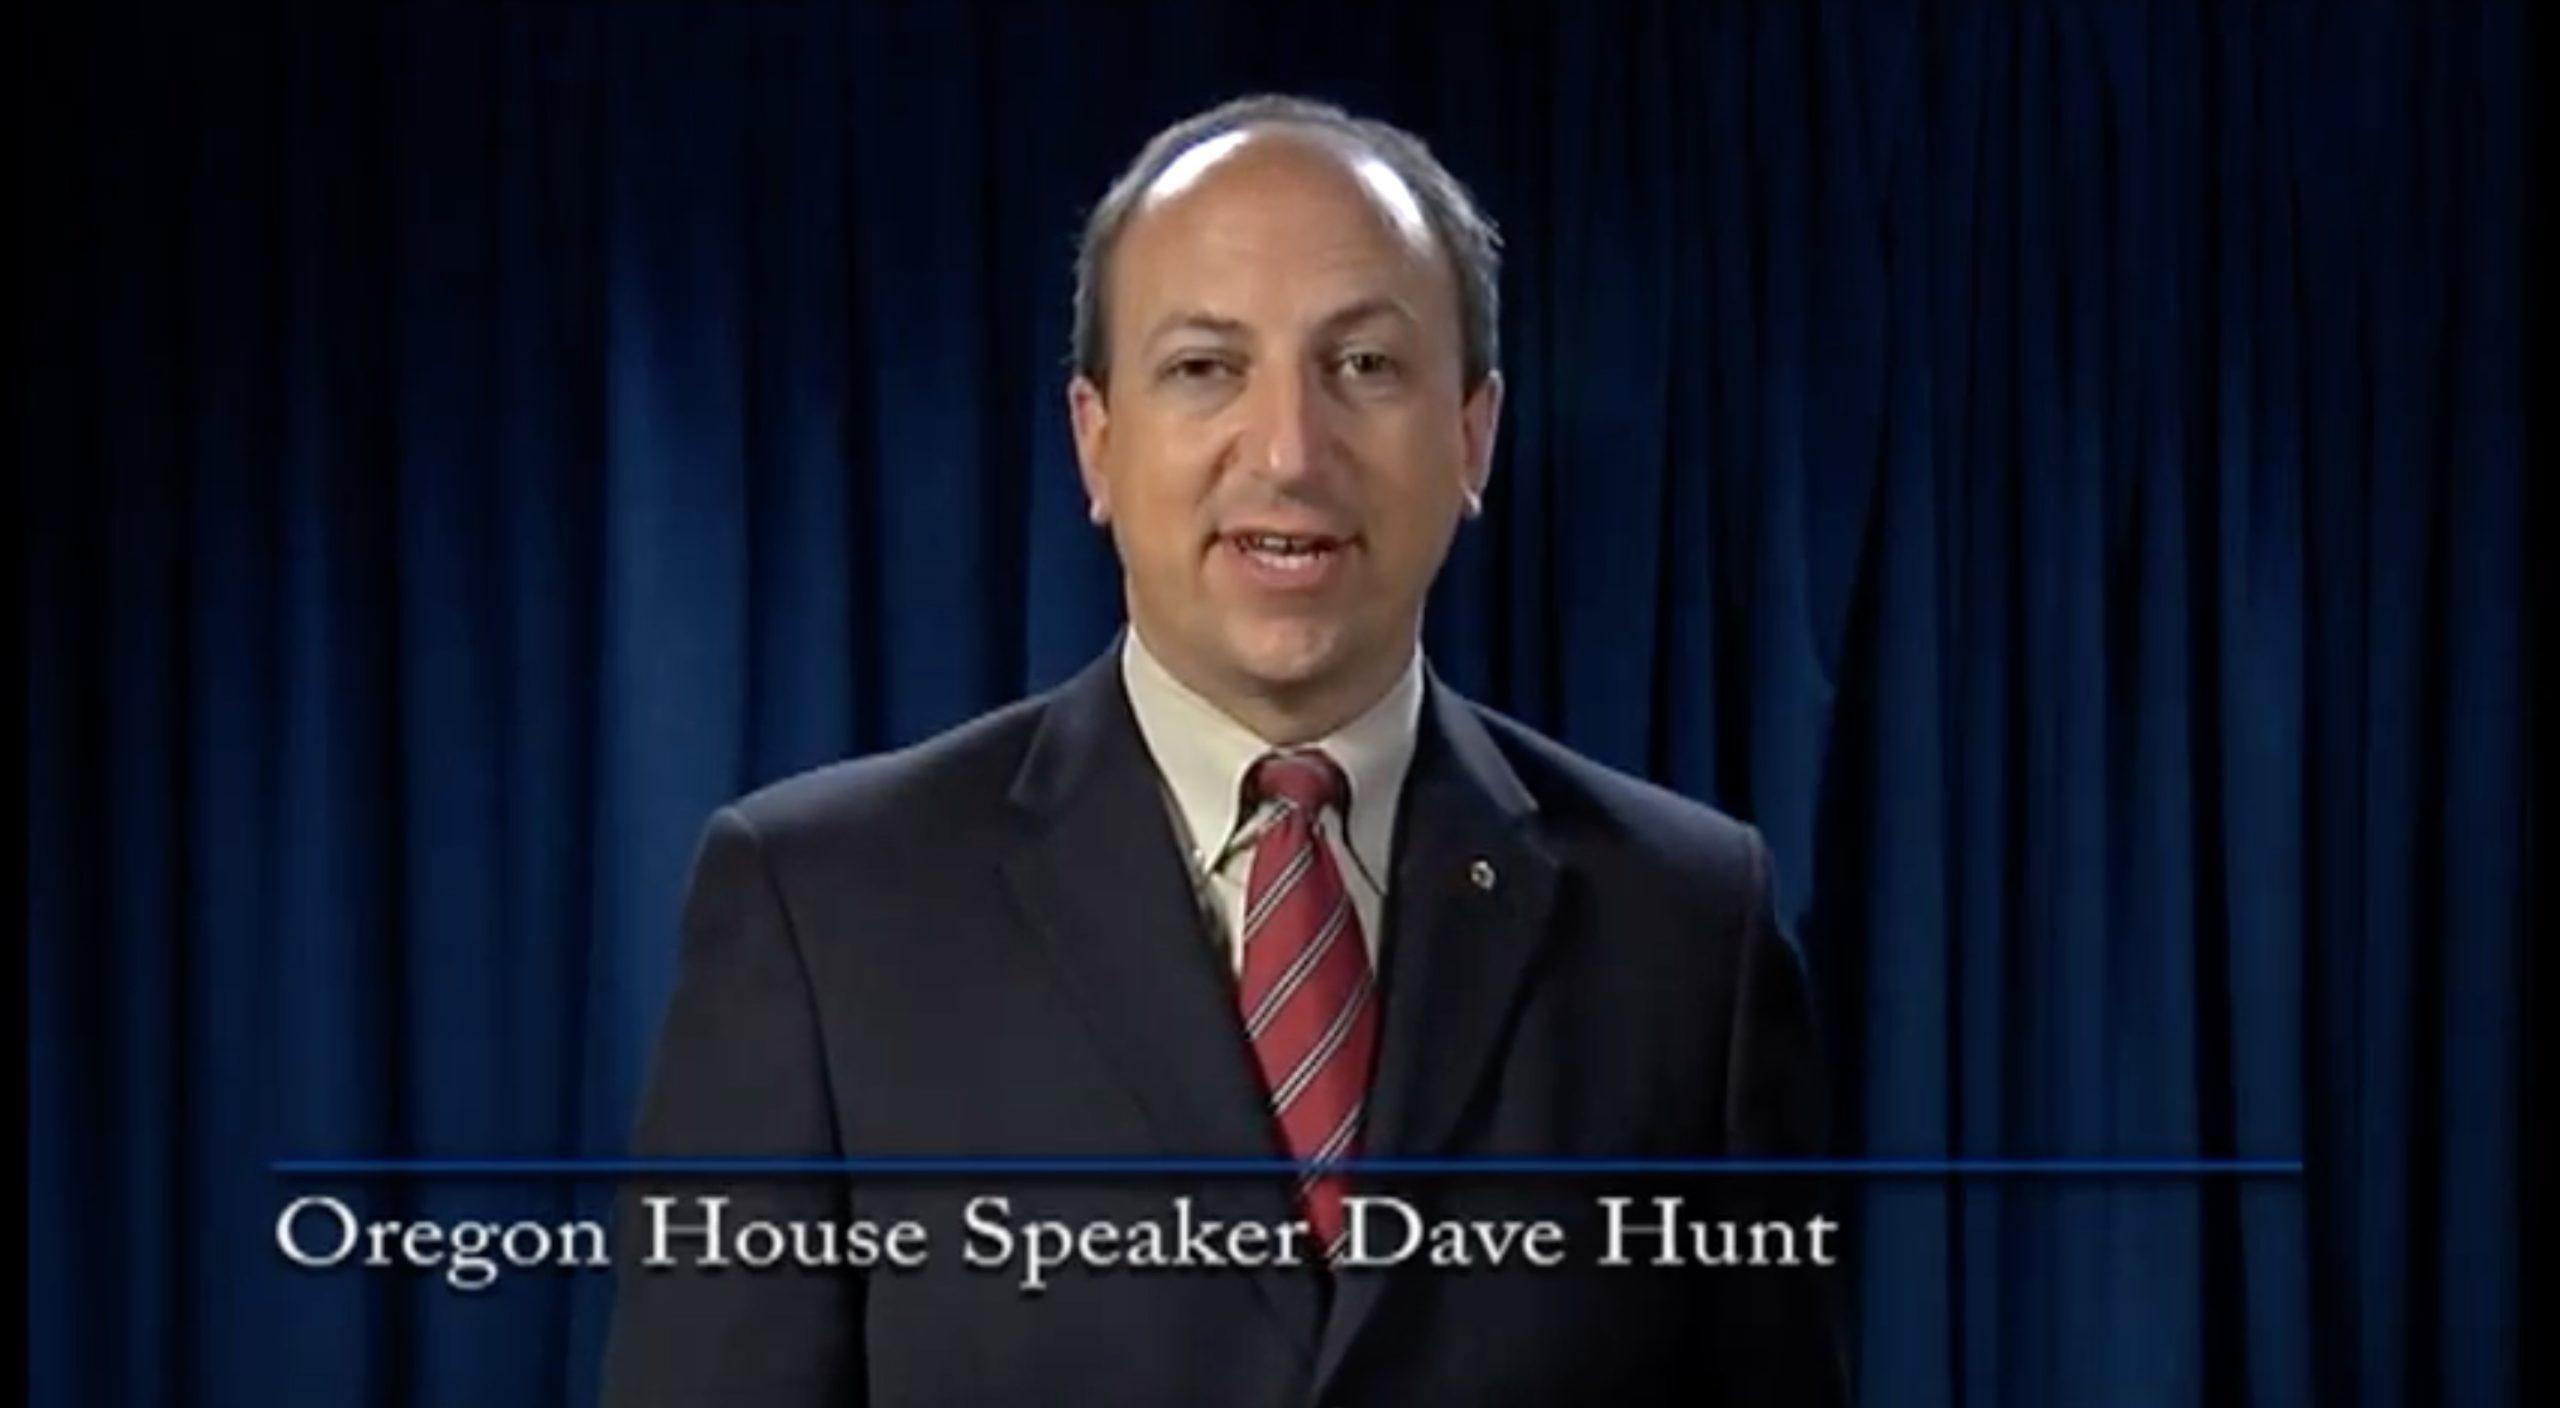 Former Democratic House Speaker of Oregon Dave Hunt accepts a legislative award in 2010. (SALDEF/Video screenshot/YouTube)